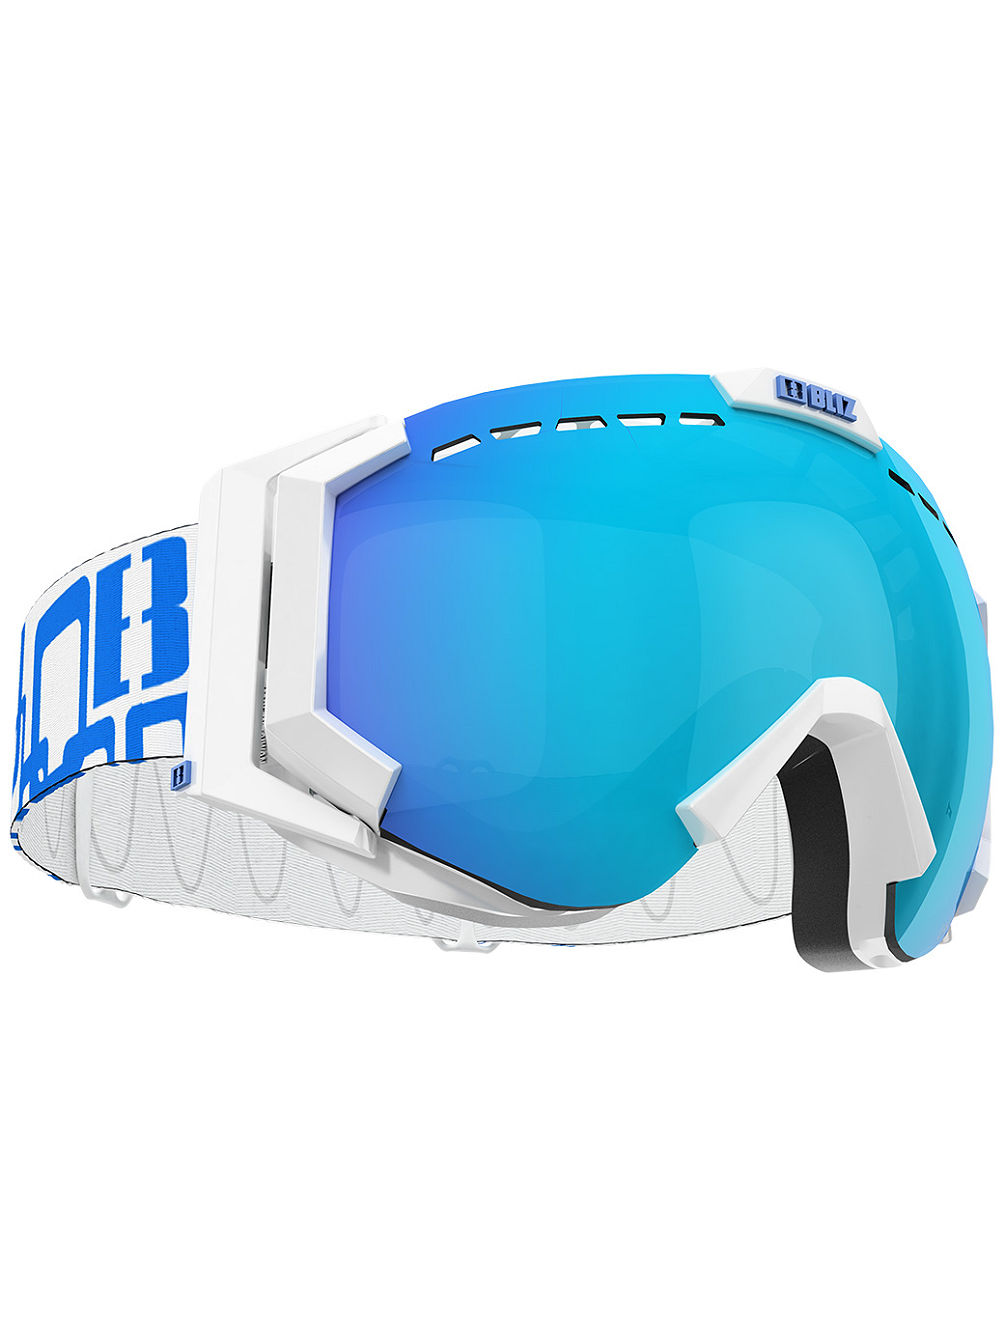 bliz-protective-sports-gear-carver-matt-white